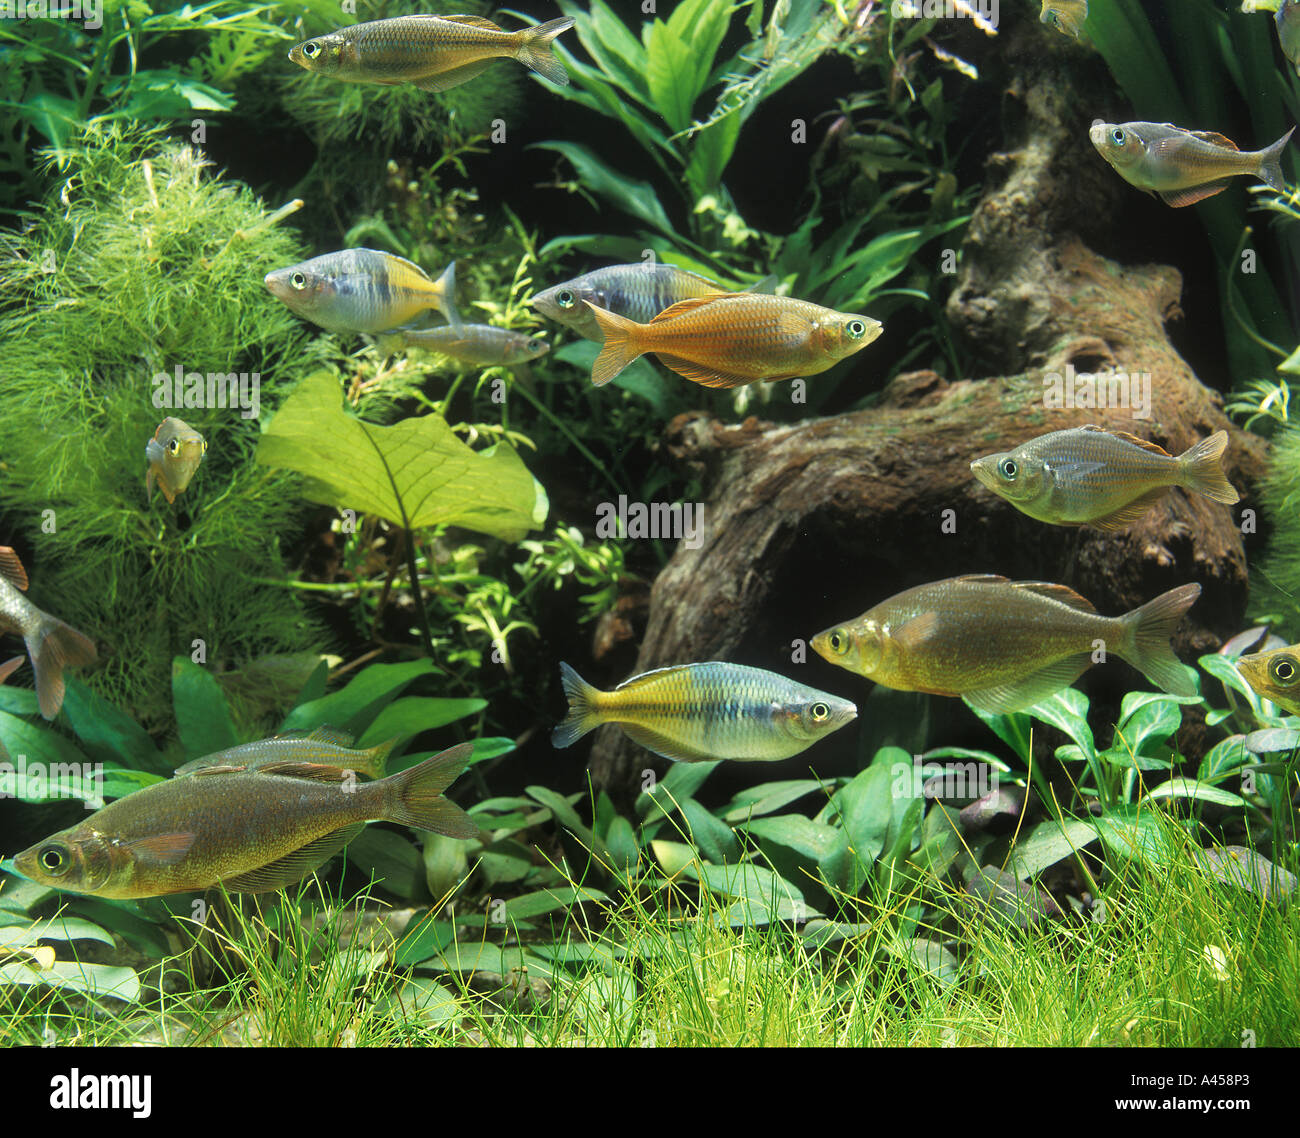 Brackish Aquarium Fish : Download image Brackish Water Aquarium Fish PC, Android, iPhone and ...